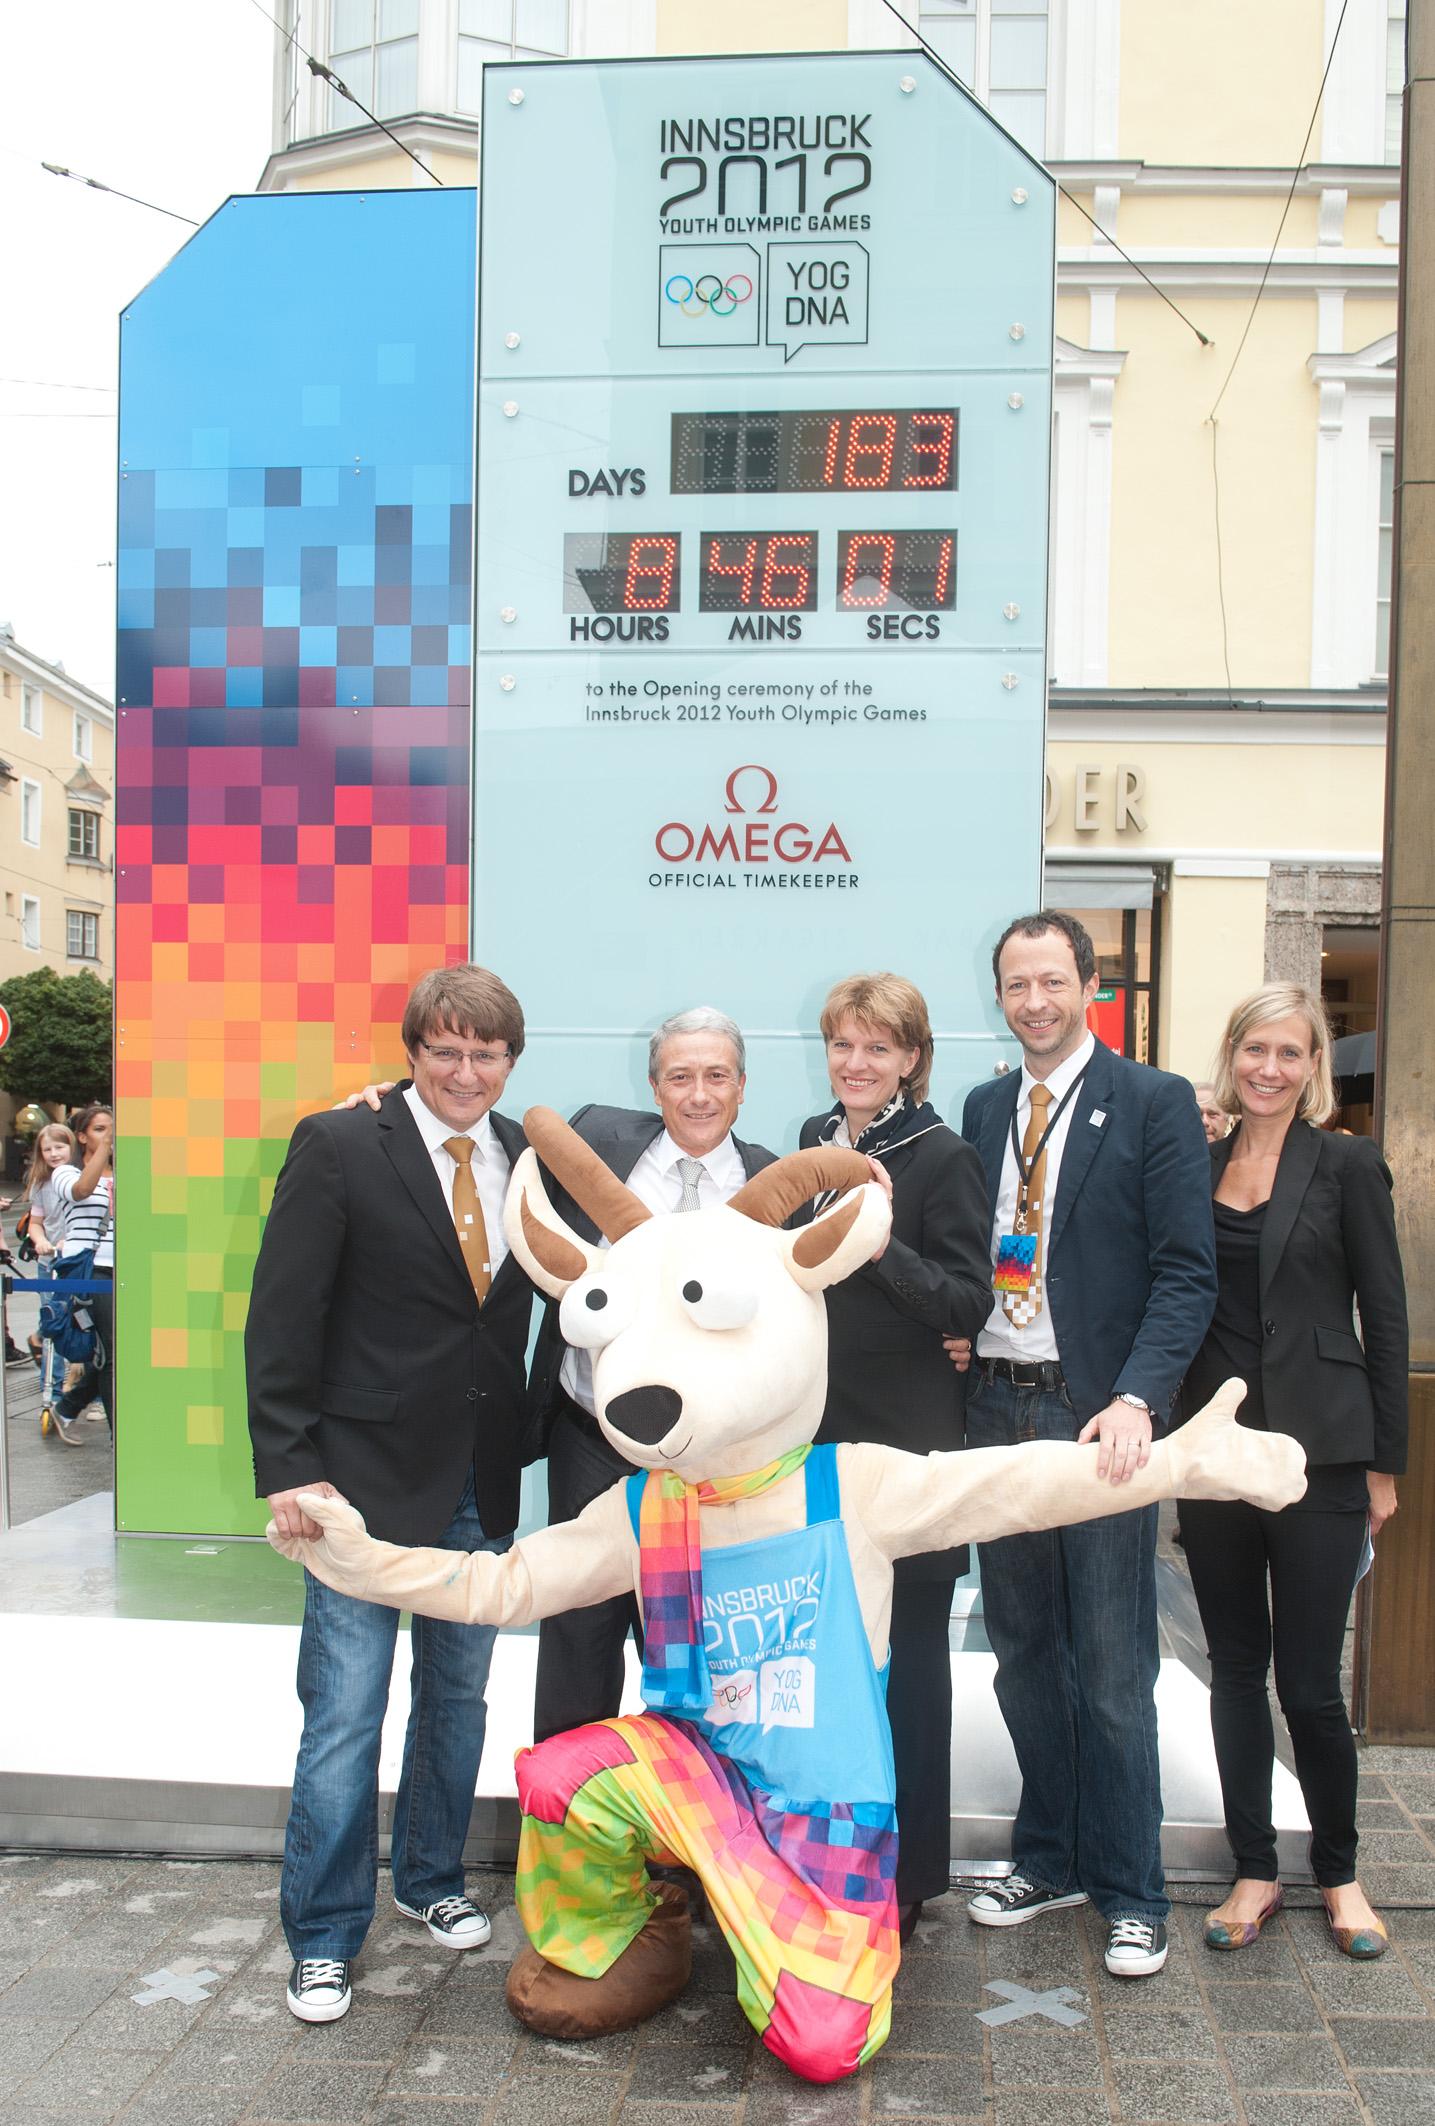 innsbruck_2012_winter_youth_olympics_clock_14-07-11